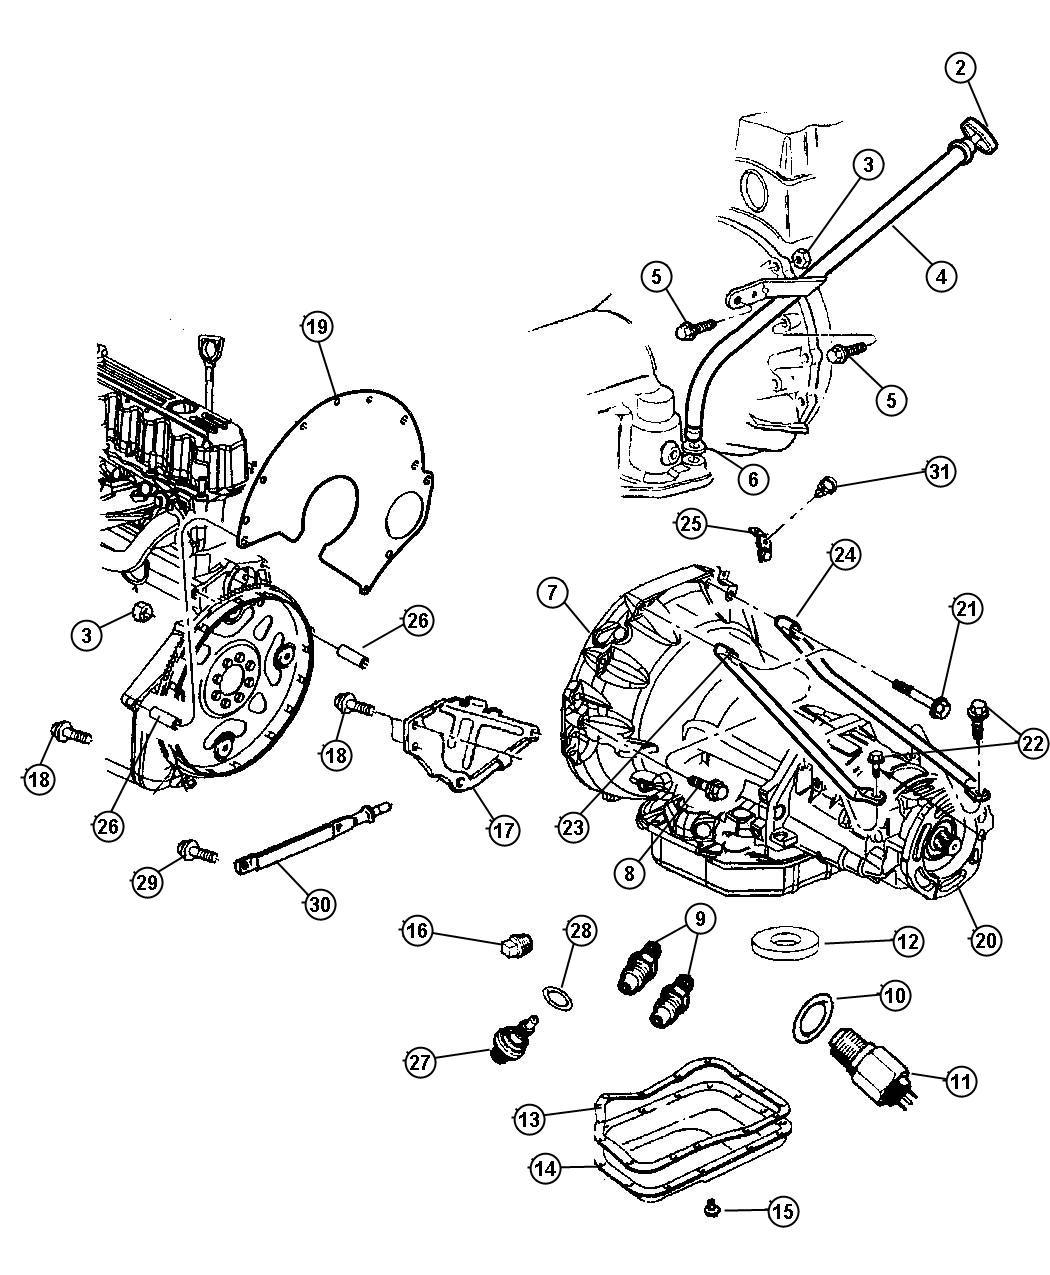 Jeep Grand Cherokee Transmission Diagram